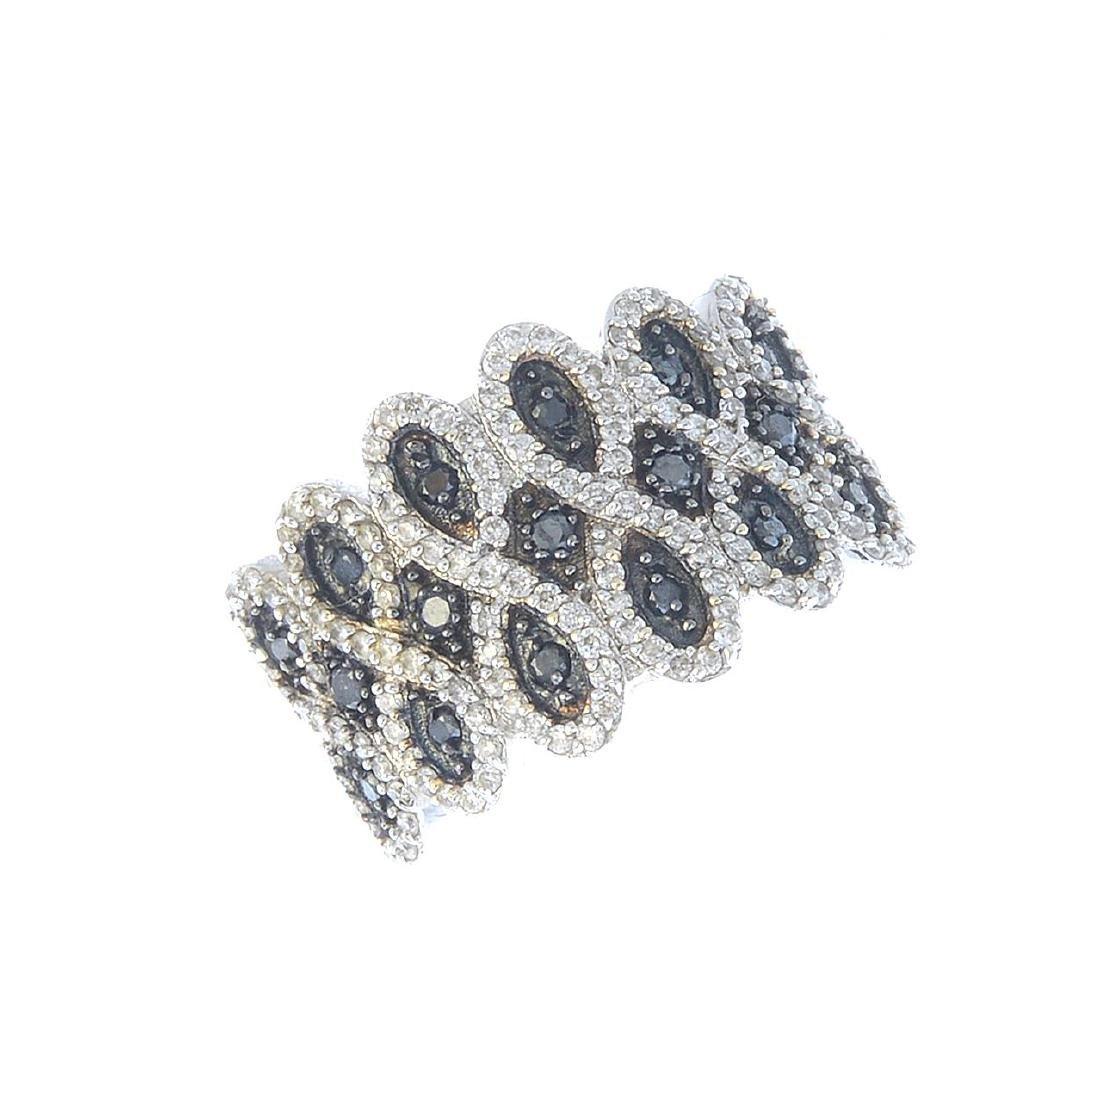 A diamond and gem-set dress ring. Designed as a series